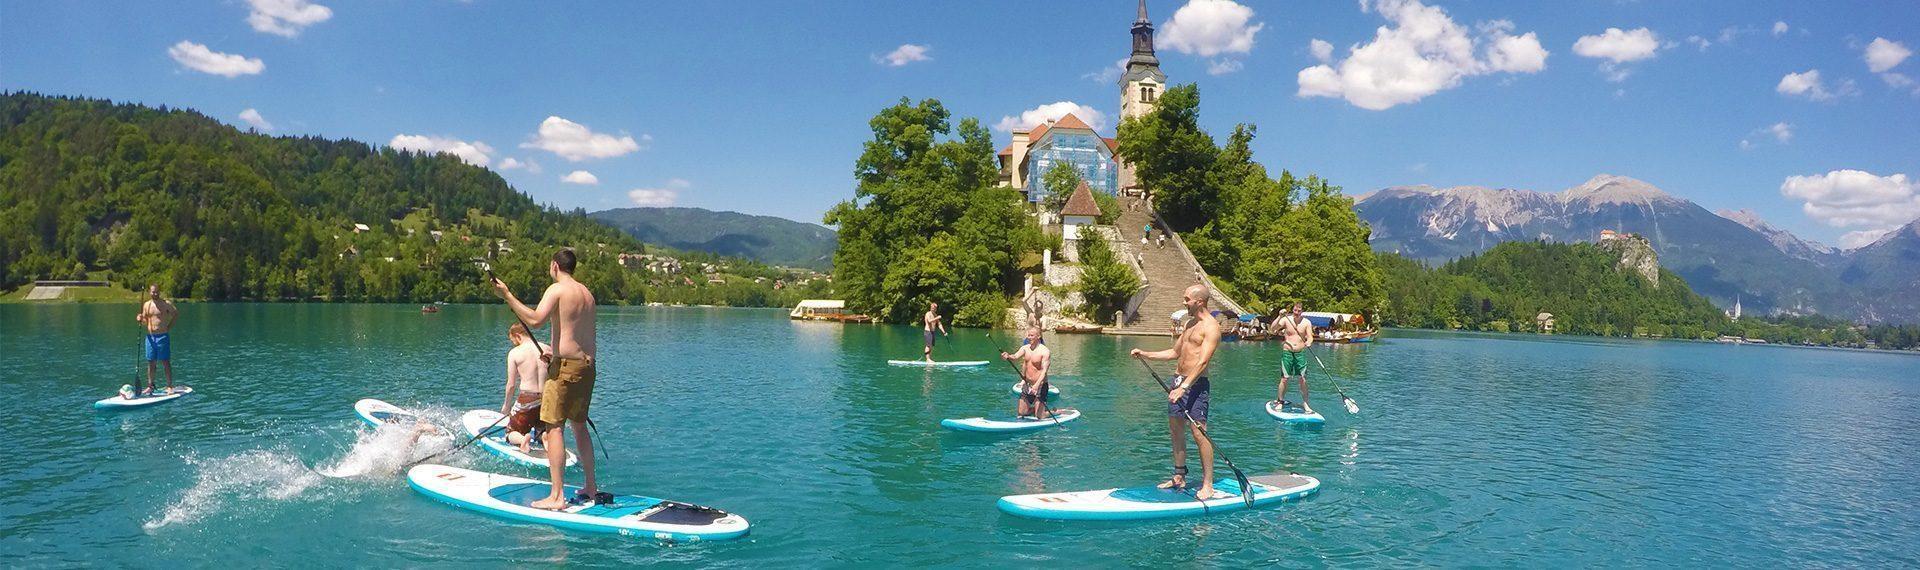 Paddle-boarding lake Bled, Slovenia